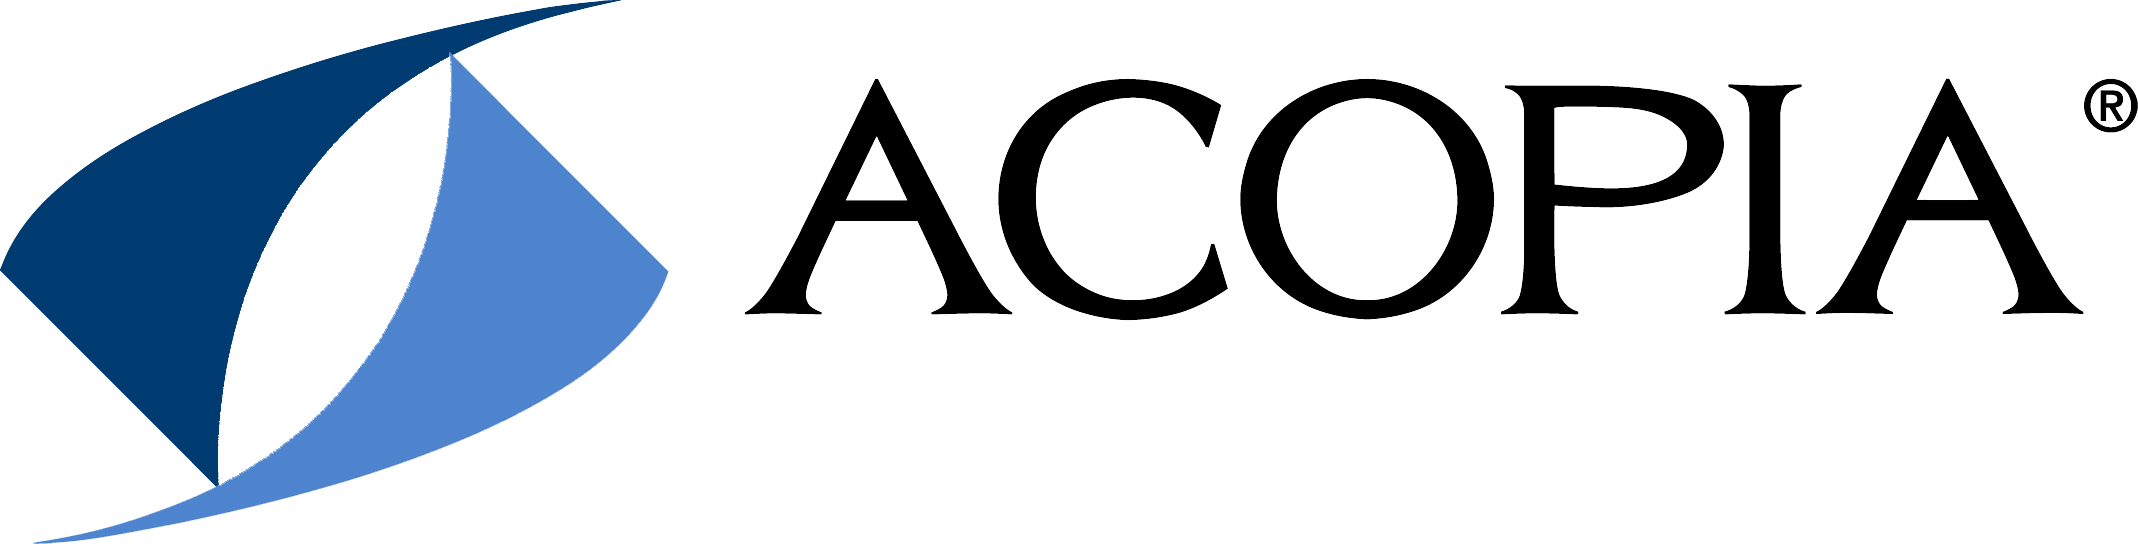 Acopia, LLC logo